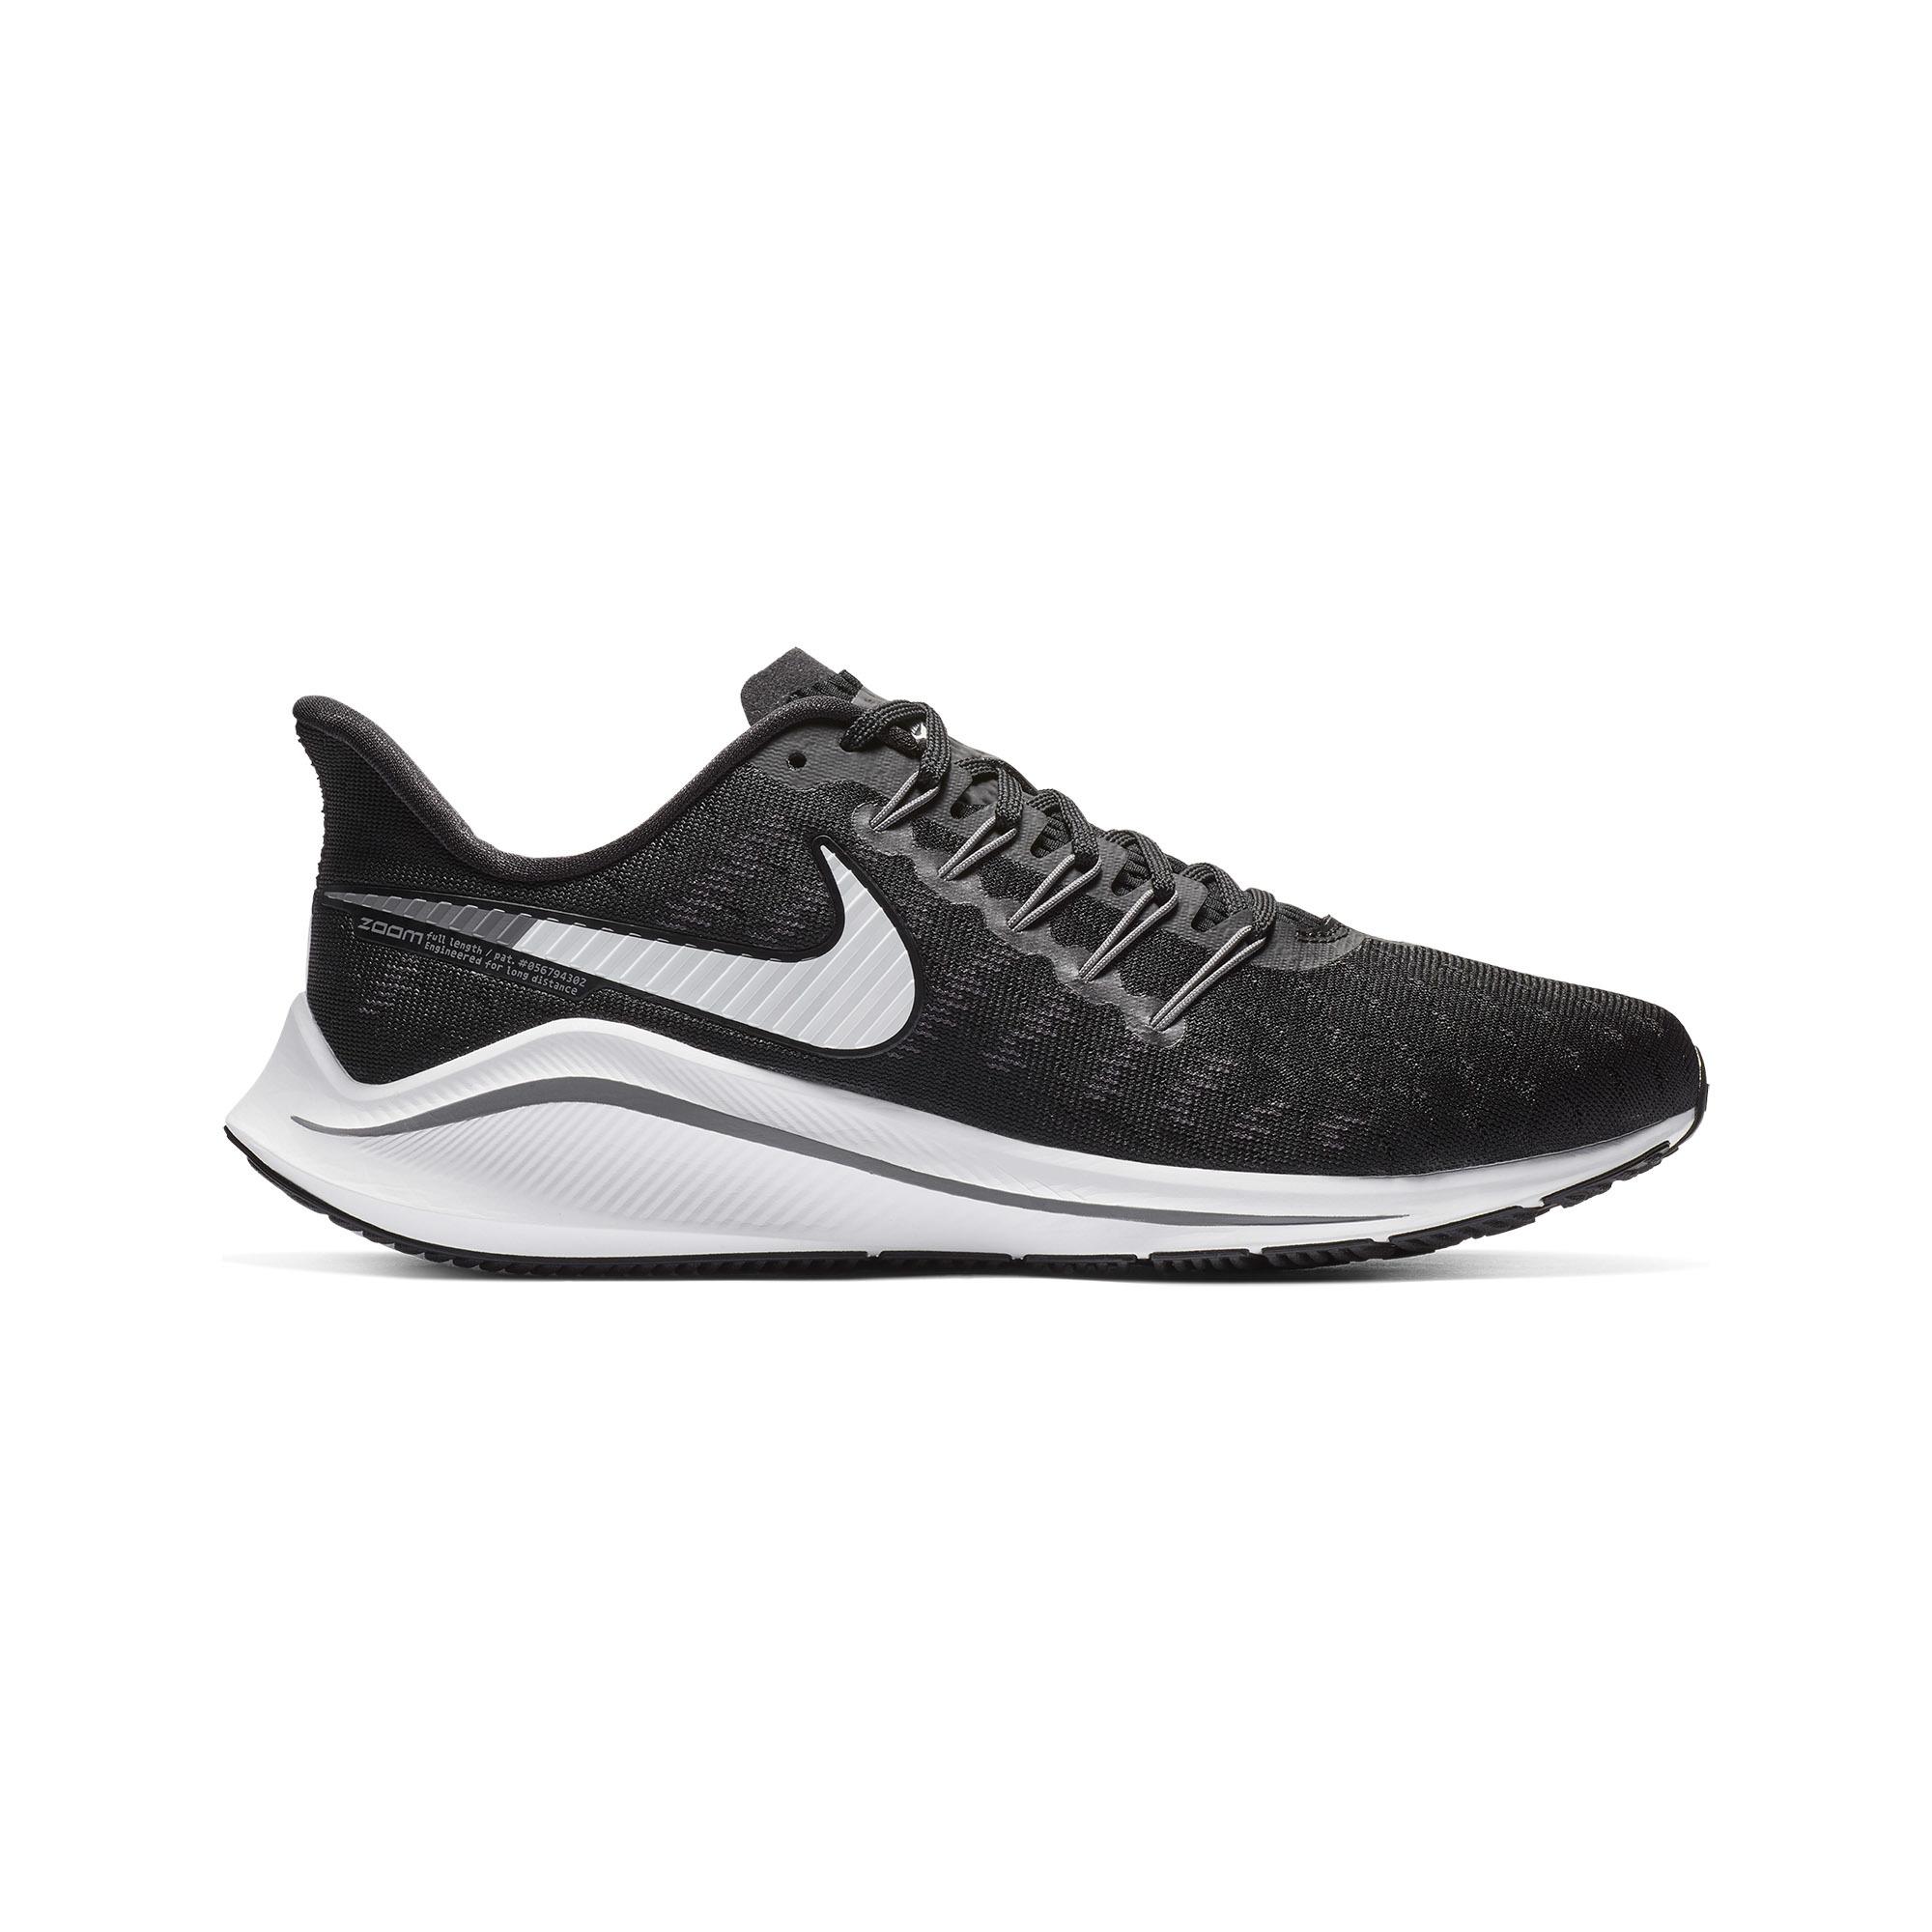 Men's | Nike Air Zoom Vomero 14